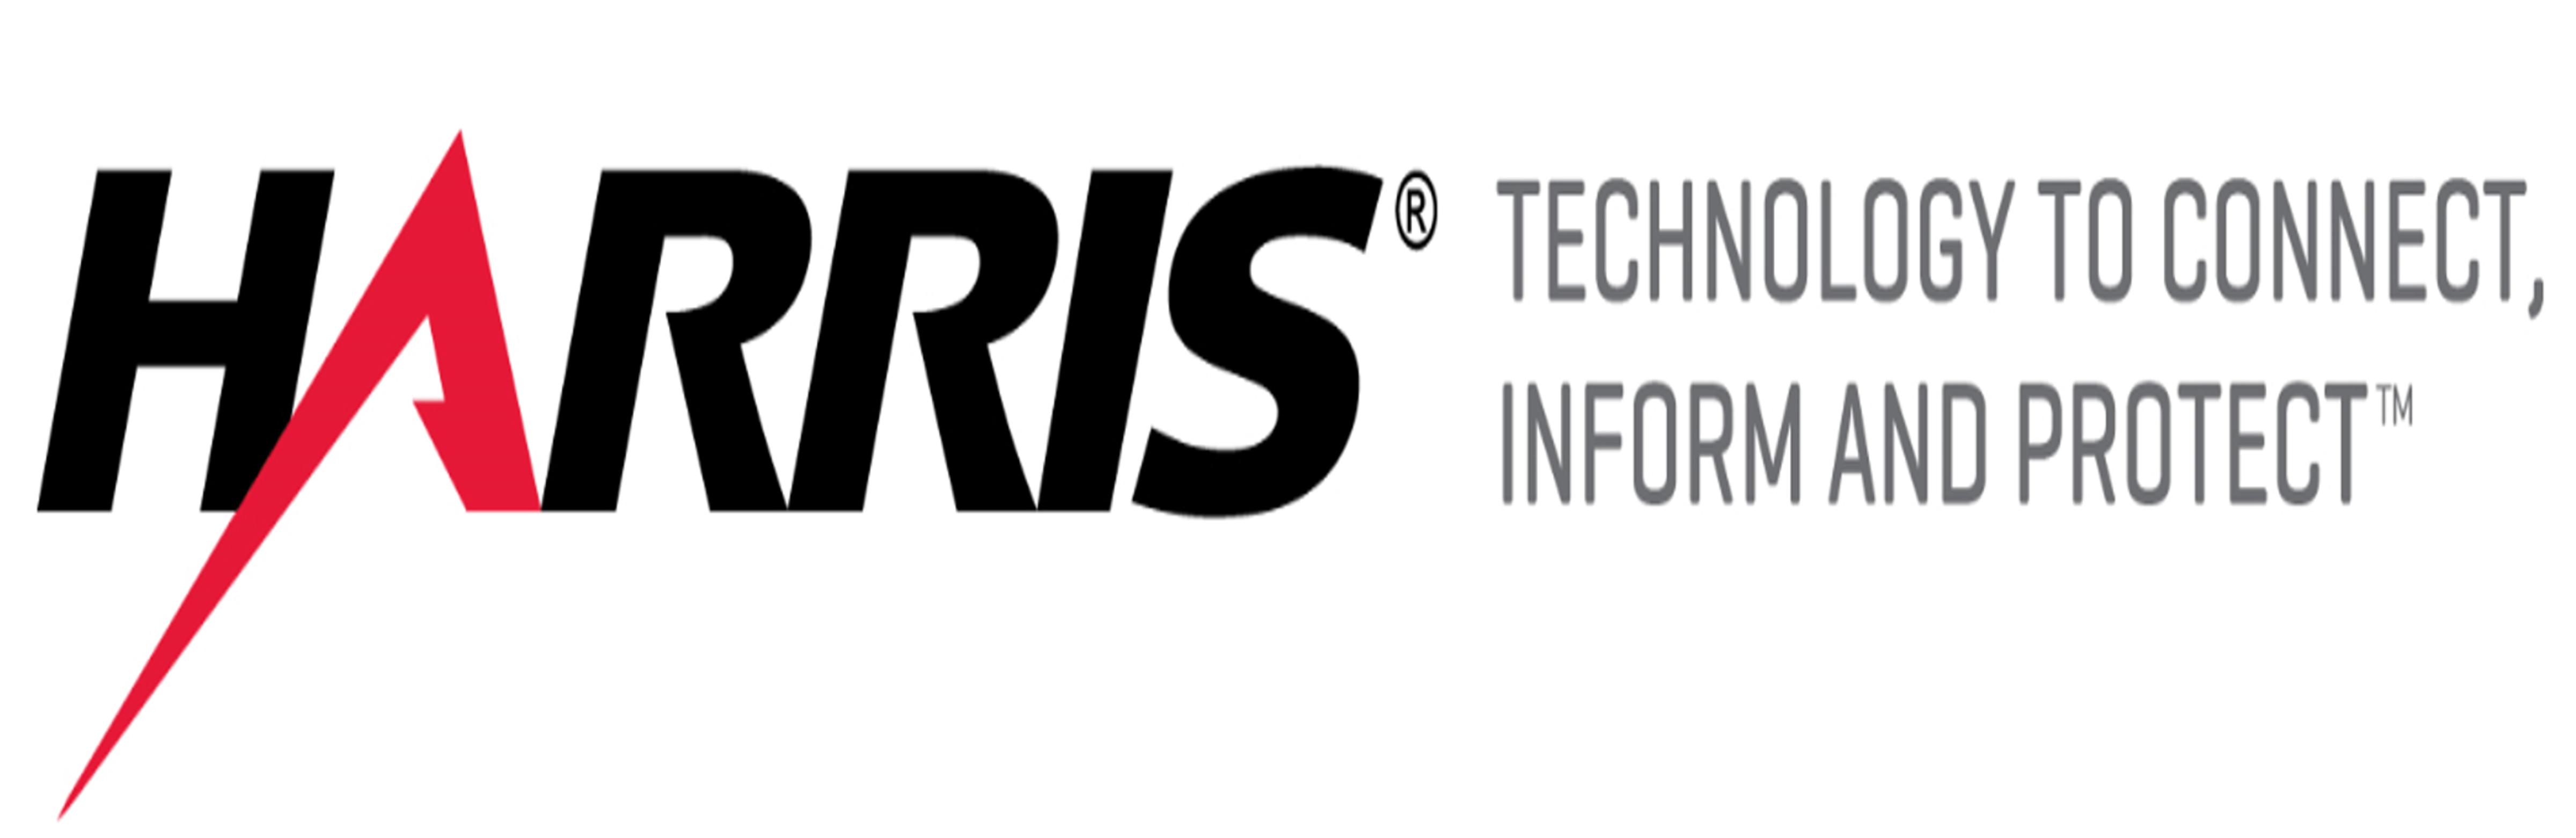 Harris 4800x1562